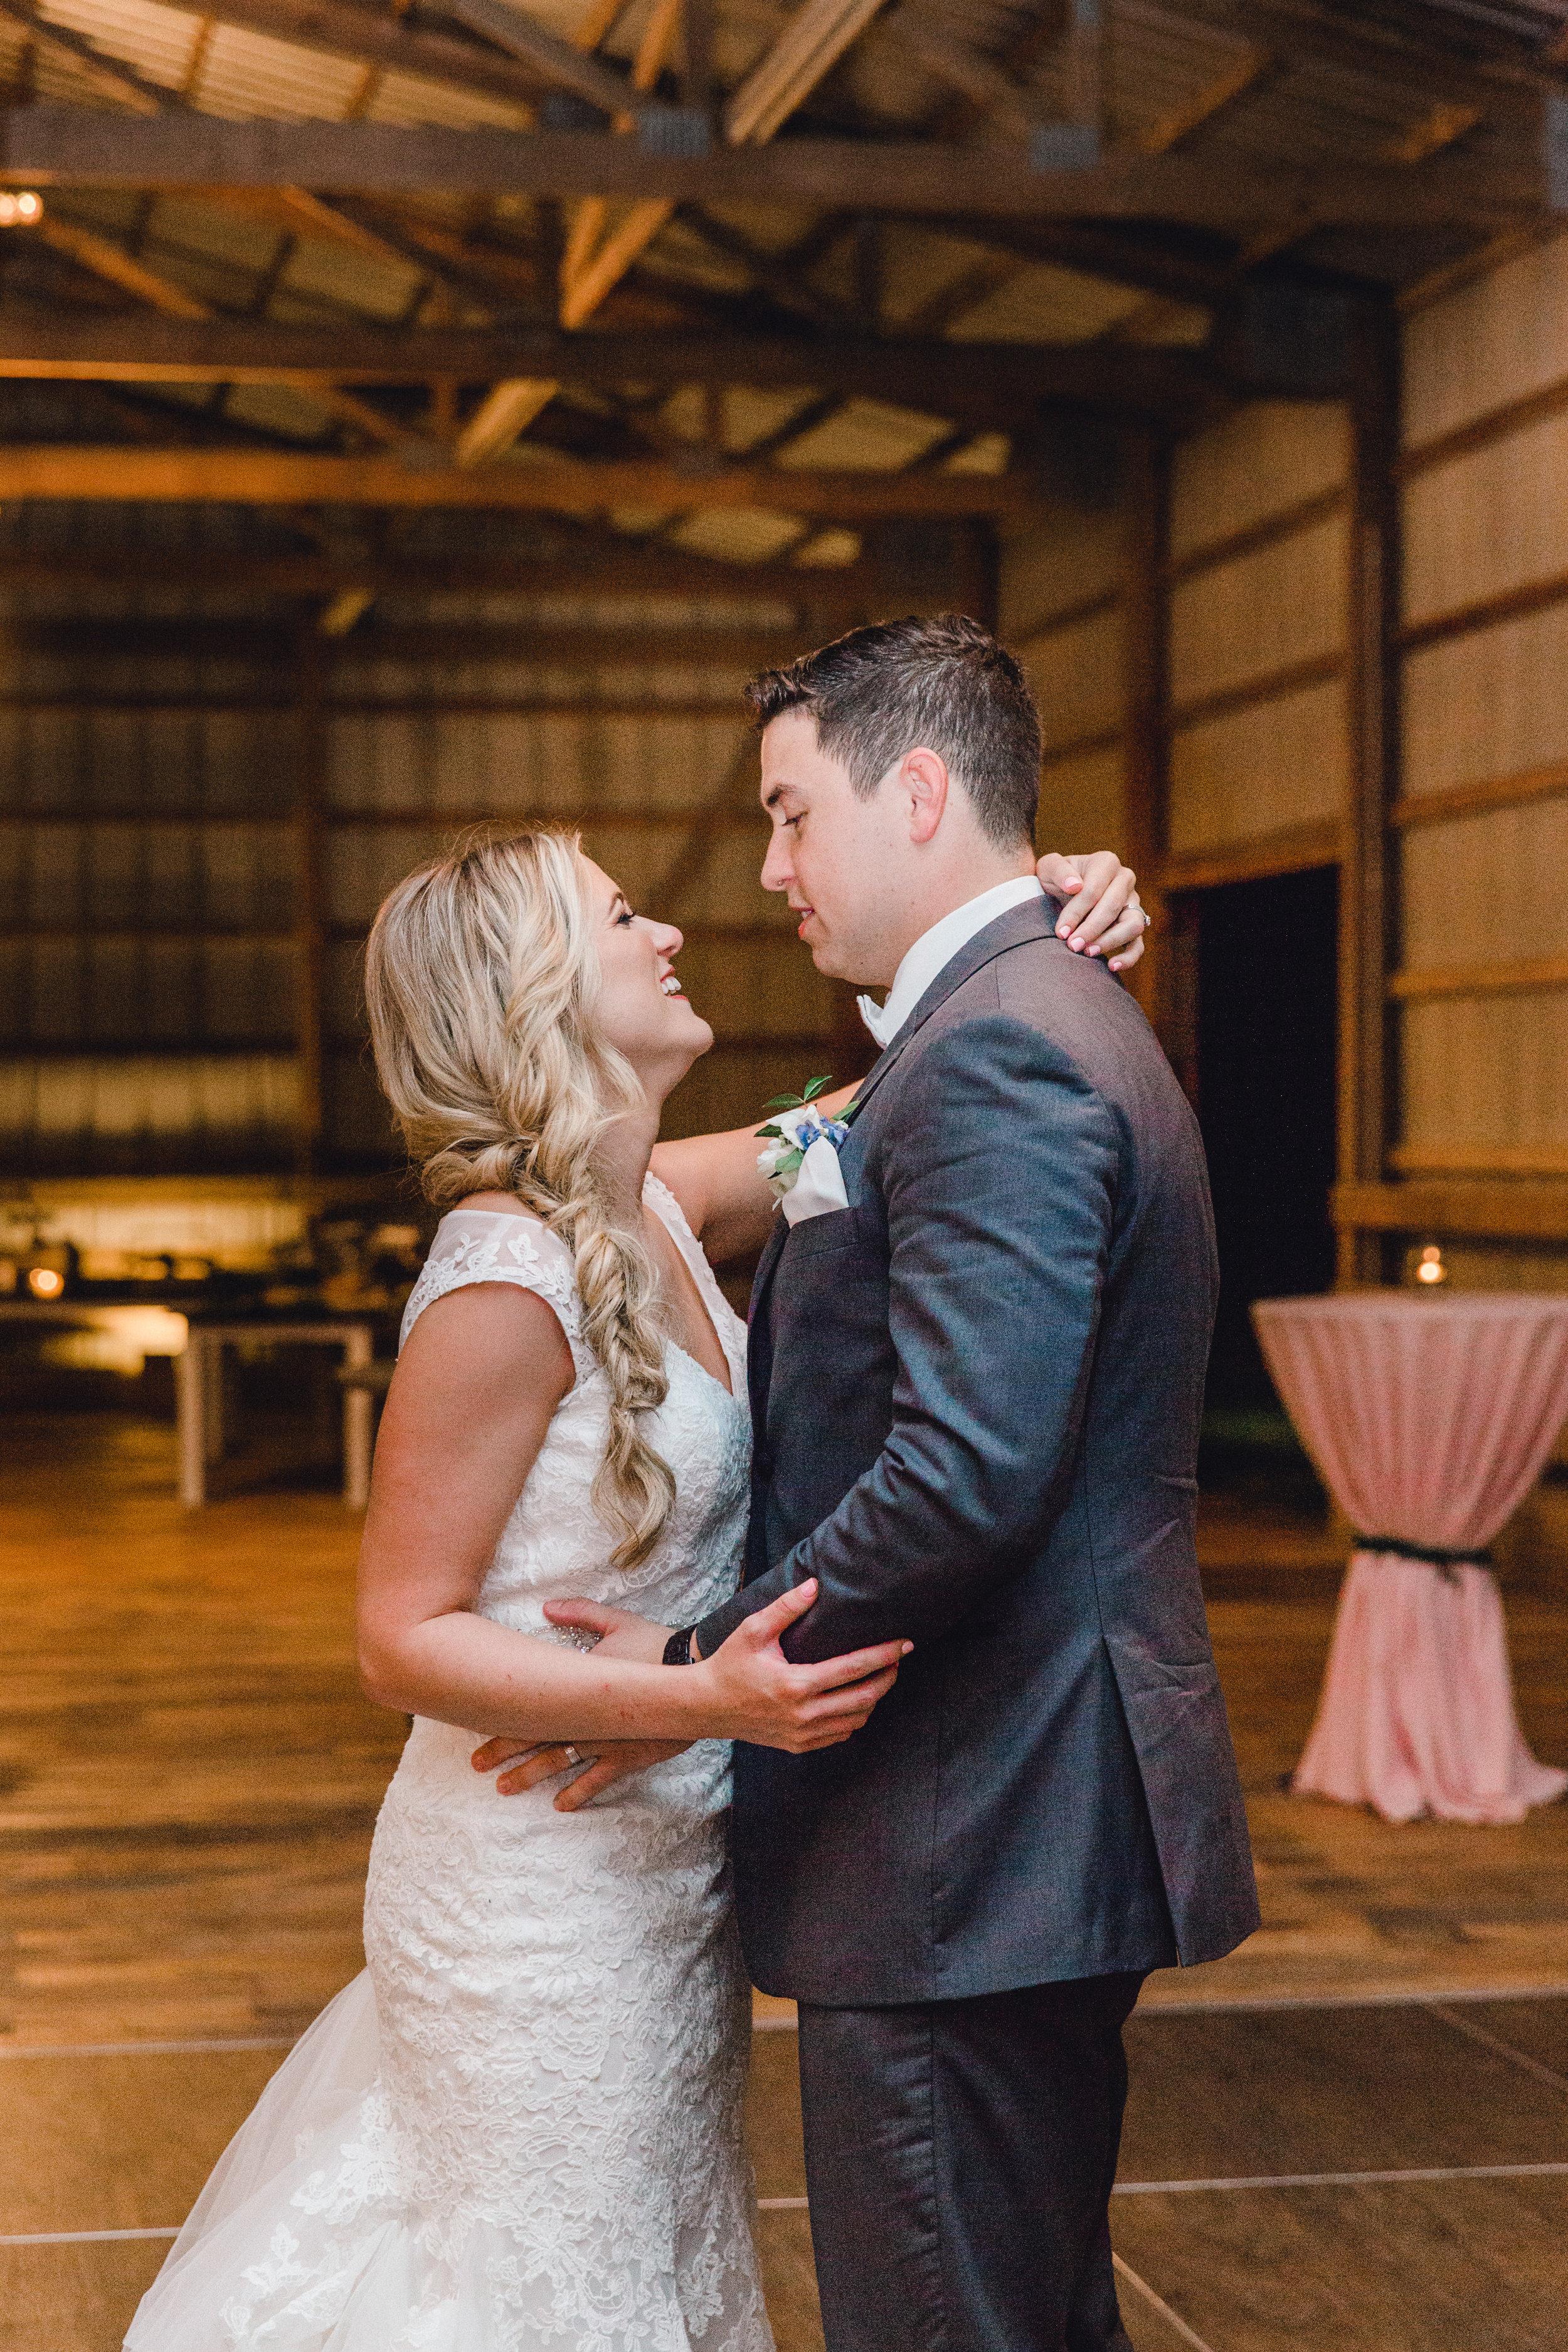 Paige-Mercer-Photography-Florida-Wedding-Photographer-Alyssa&Drew-83.jpg